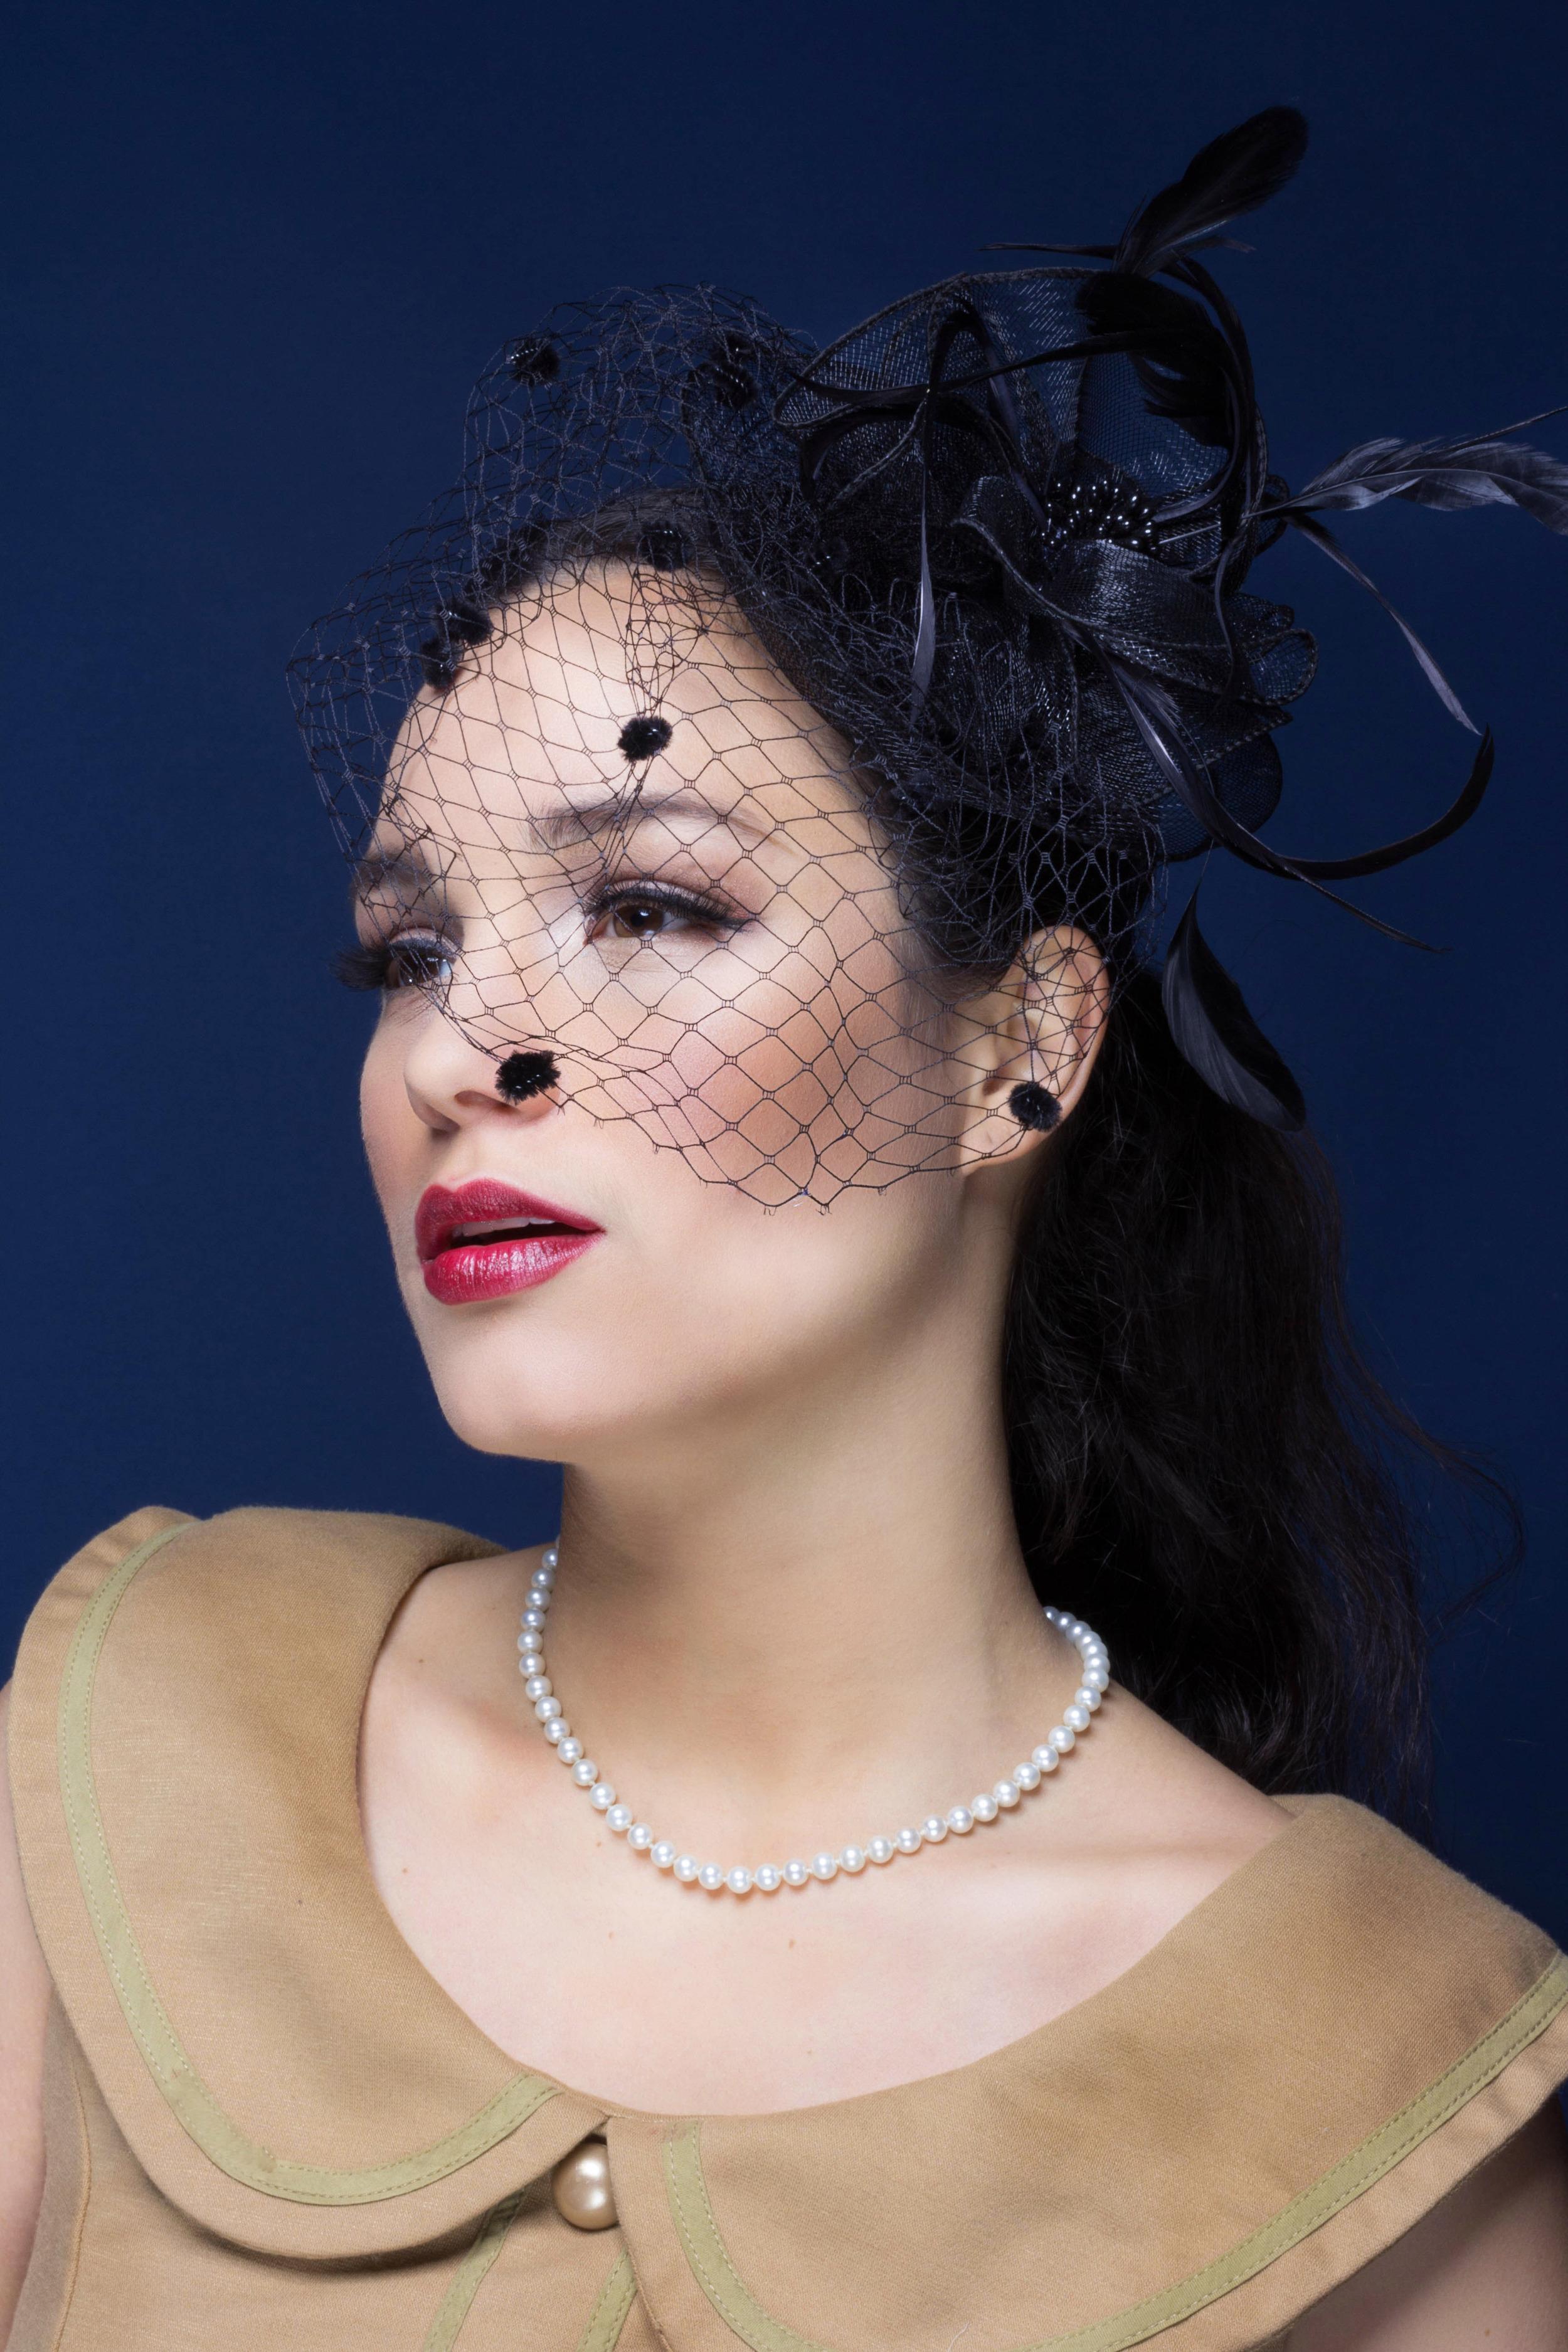 Singer Juliana